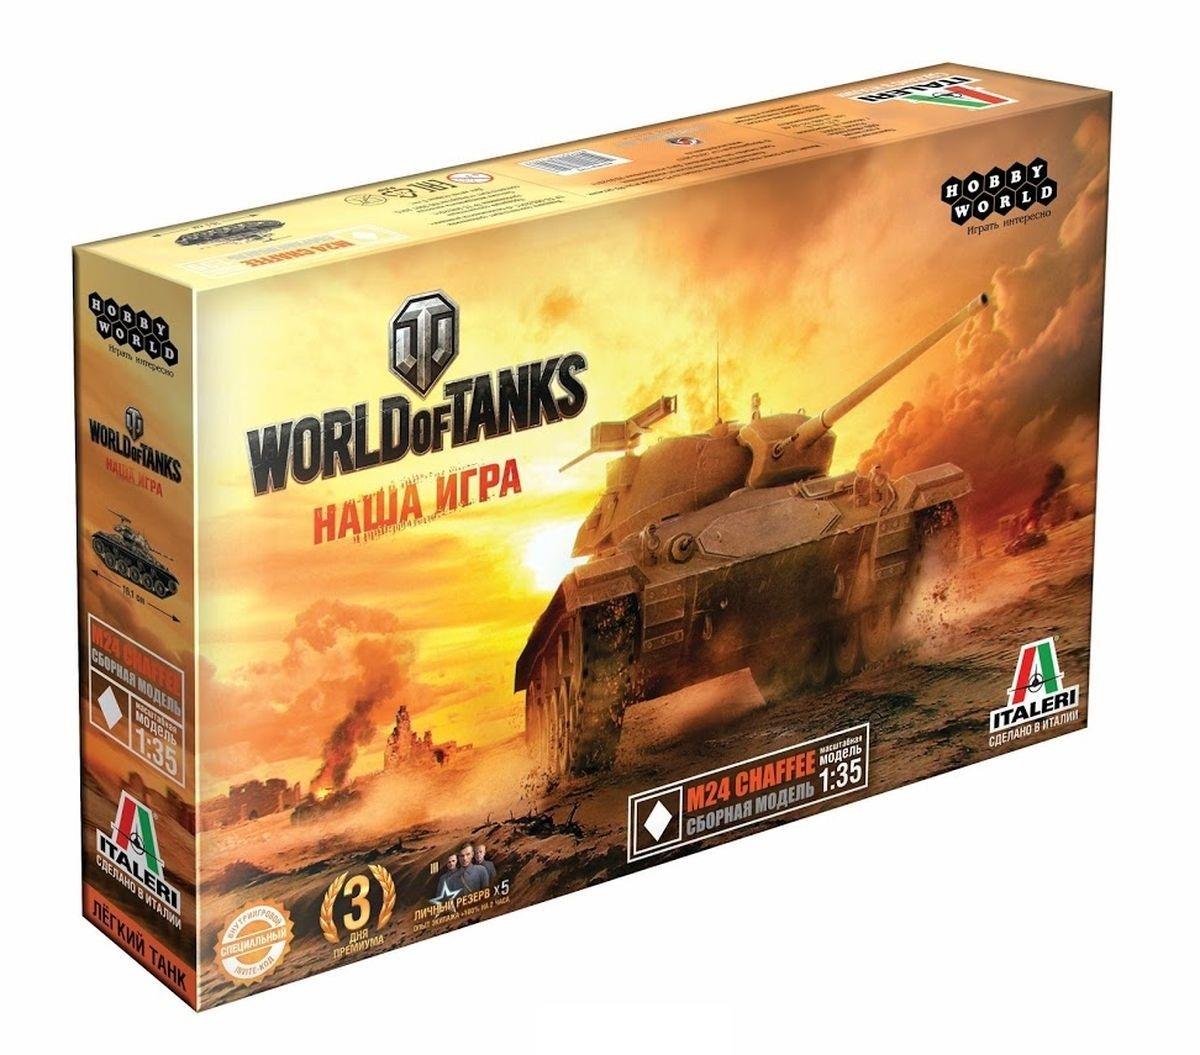 World of Tanks. M24 CHAFFEE. Масштабная модель 1 35 (Сборный танк) world of tanks официальный сайт золото за смс